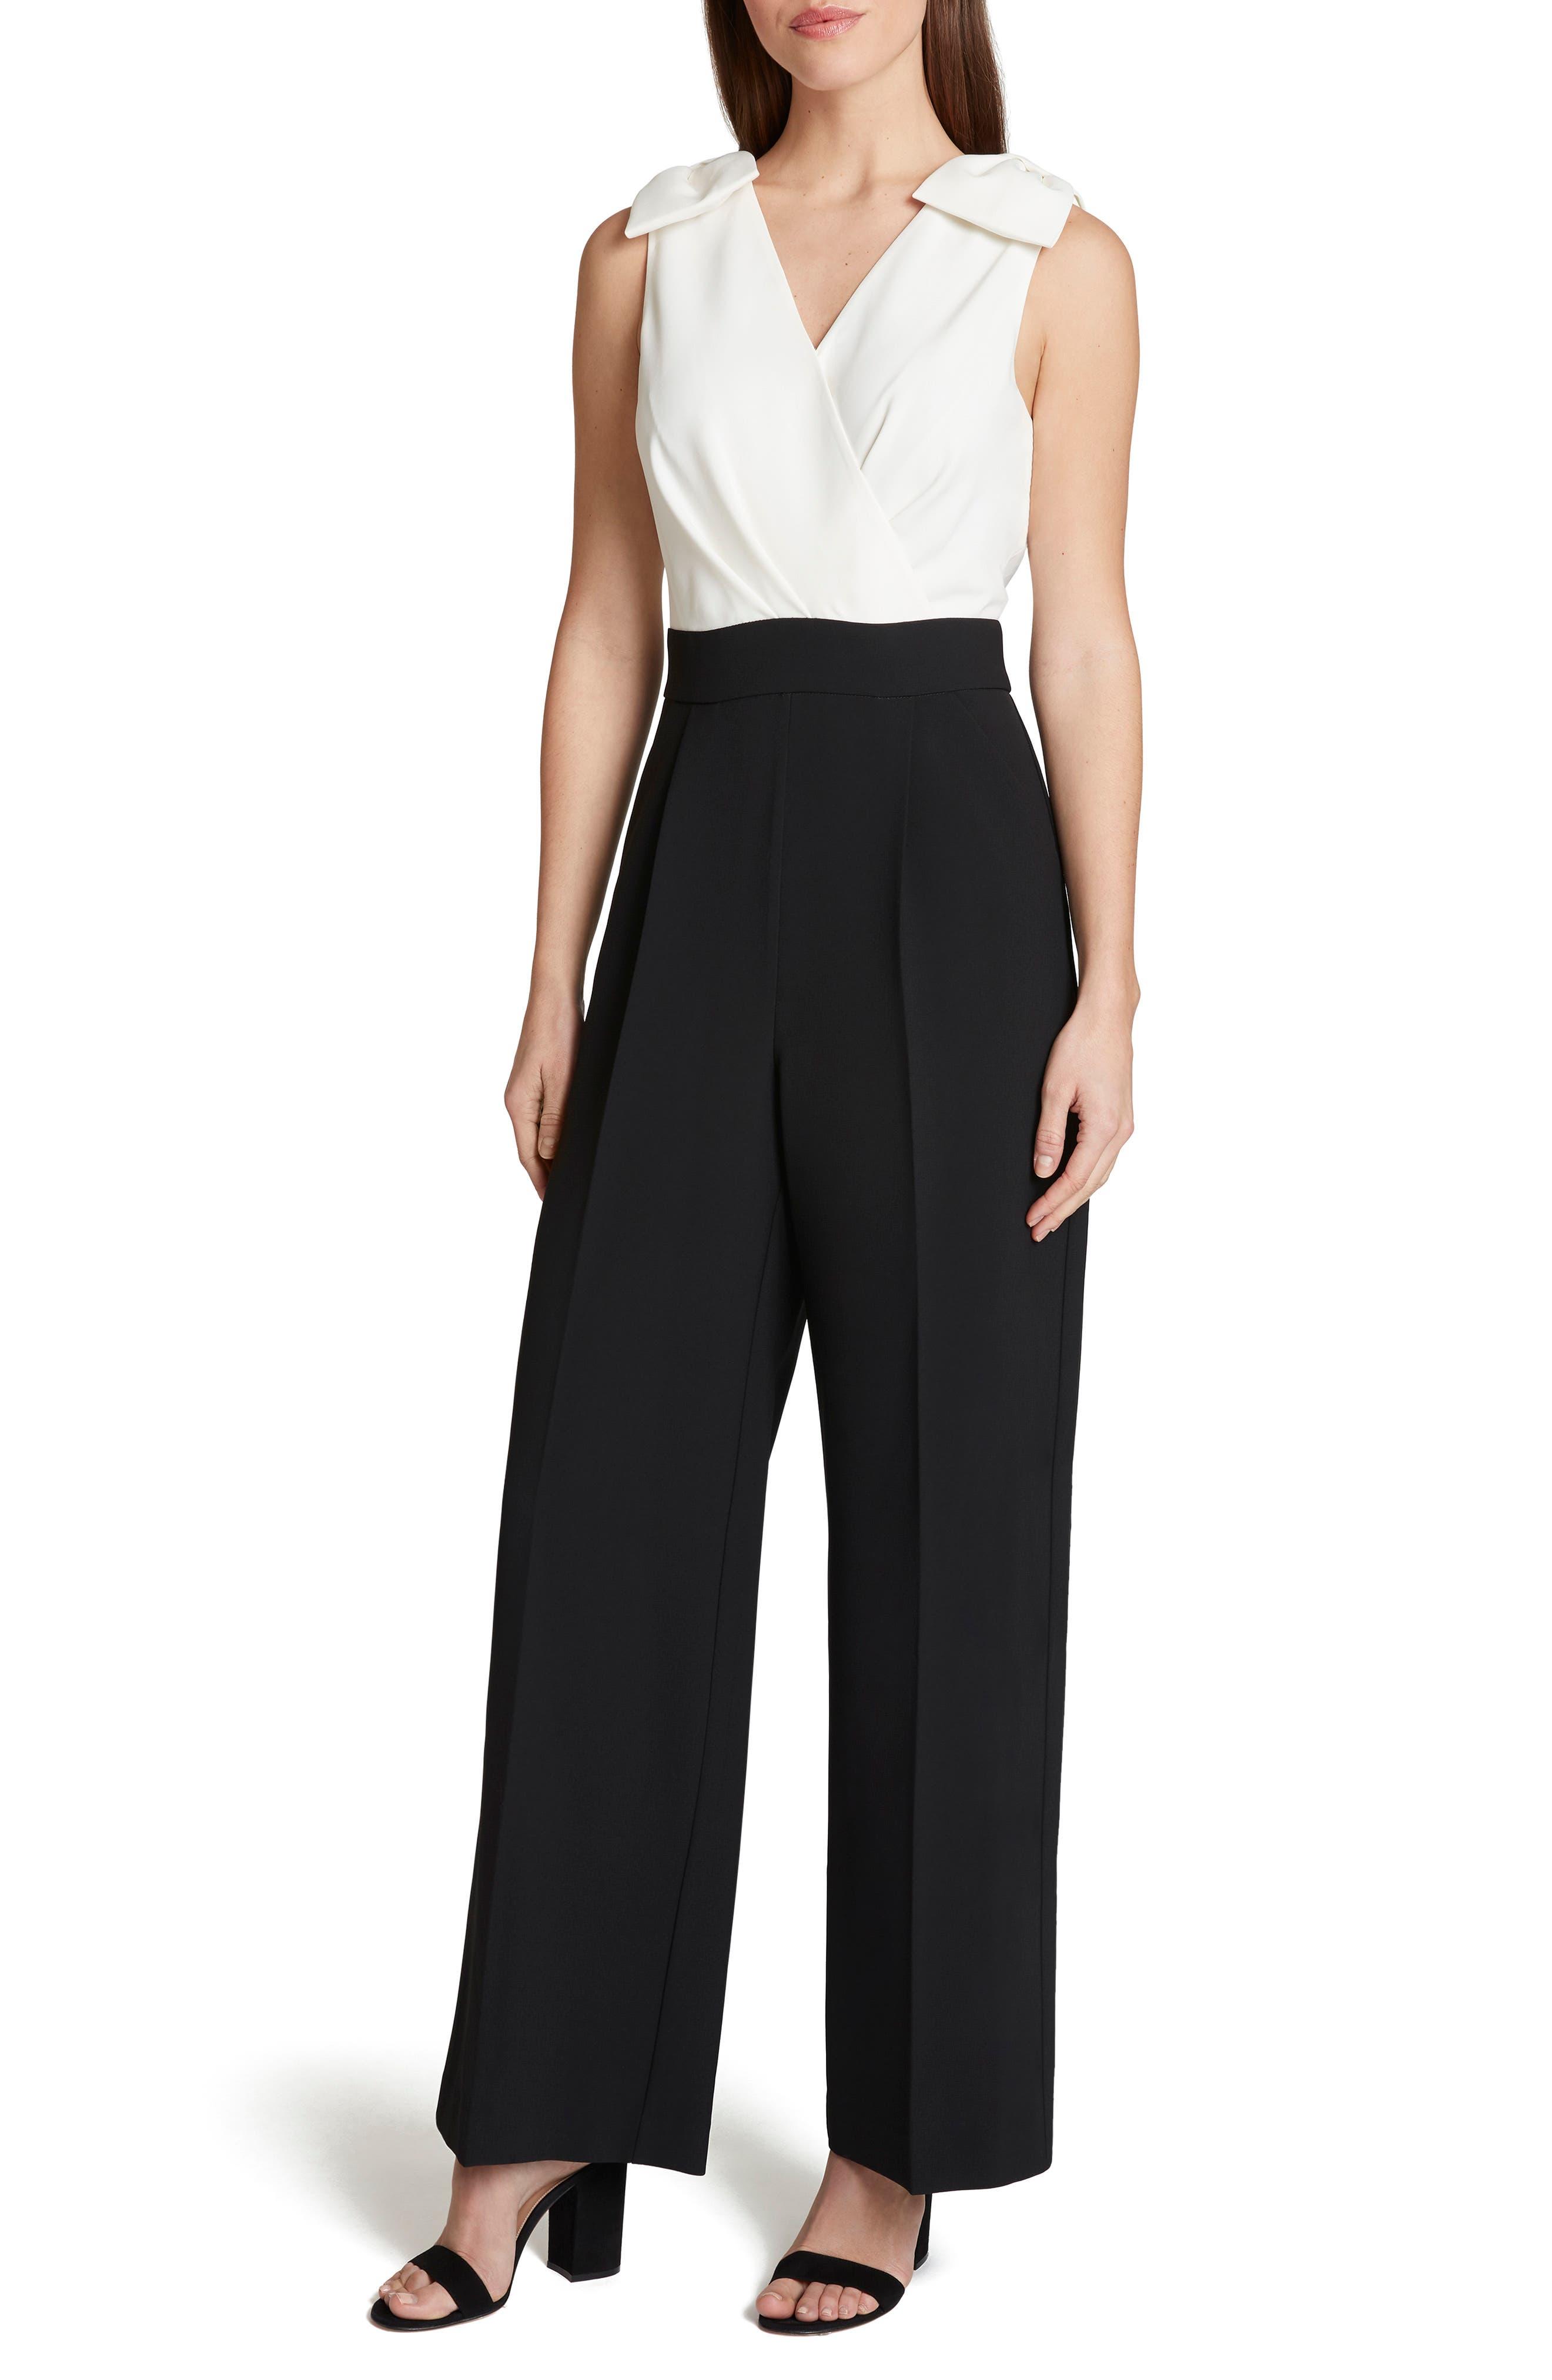 Vintage High Waisted Trousers, Sailor Pants, Jeans Womens Tahari Bow Surplice Wide Leg Jumpsuit $158.00 AT vintagedancer.com